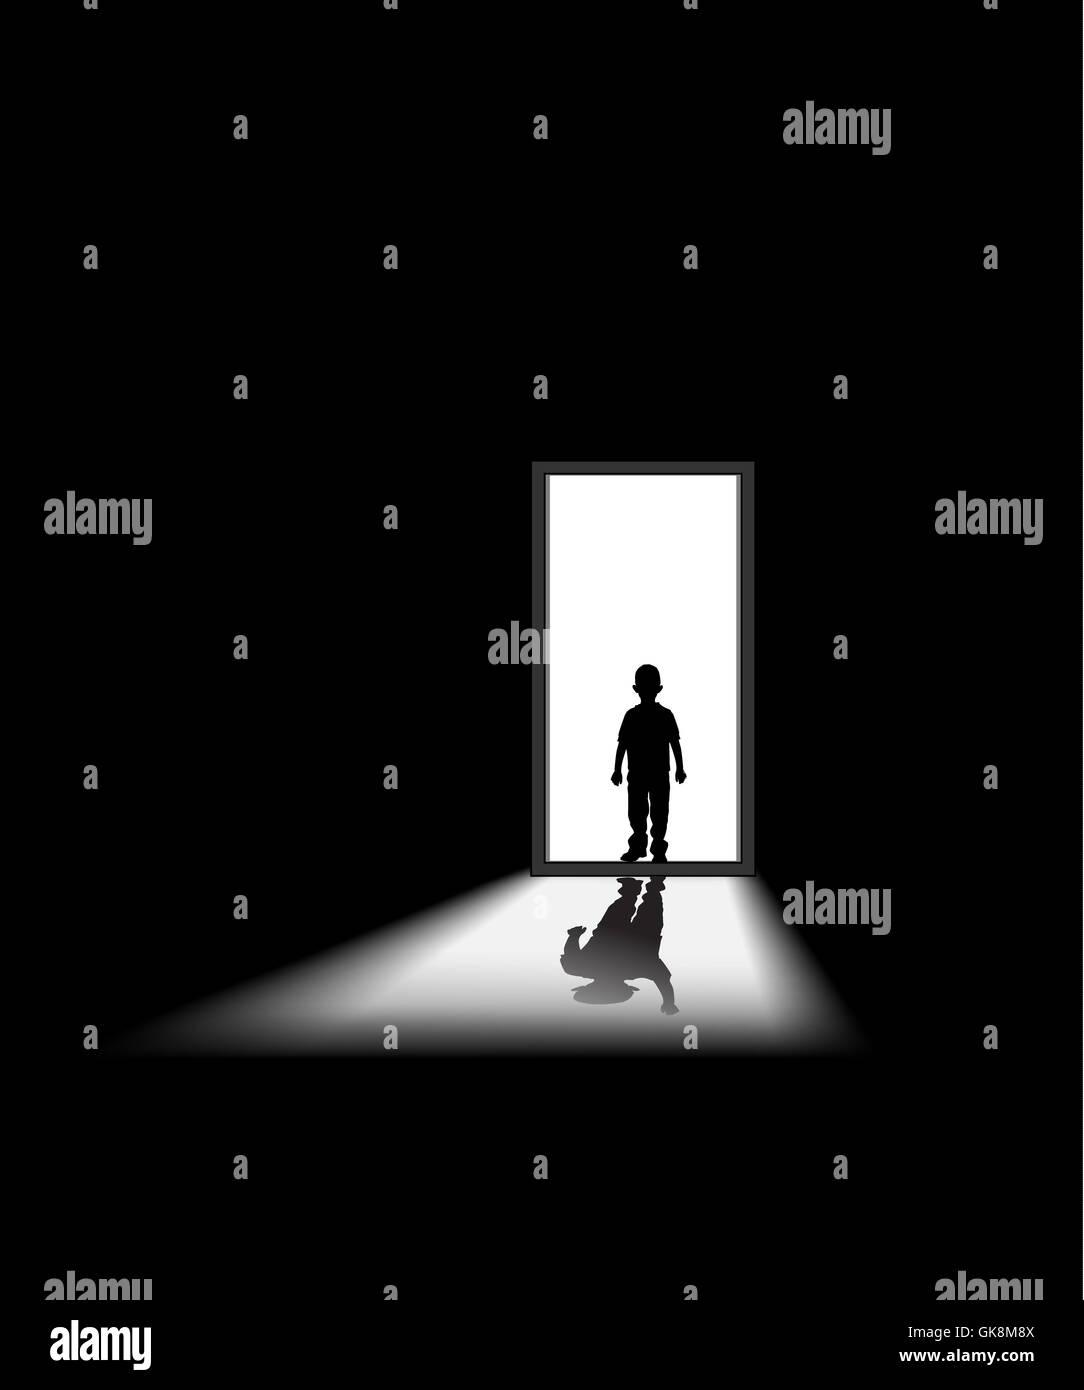 darkness black swarthy - Stock Image